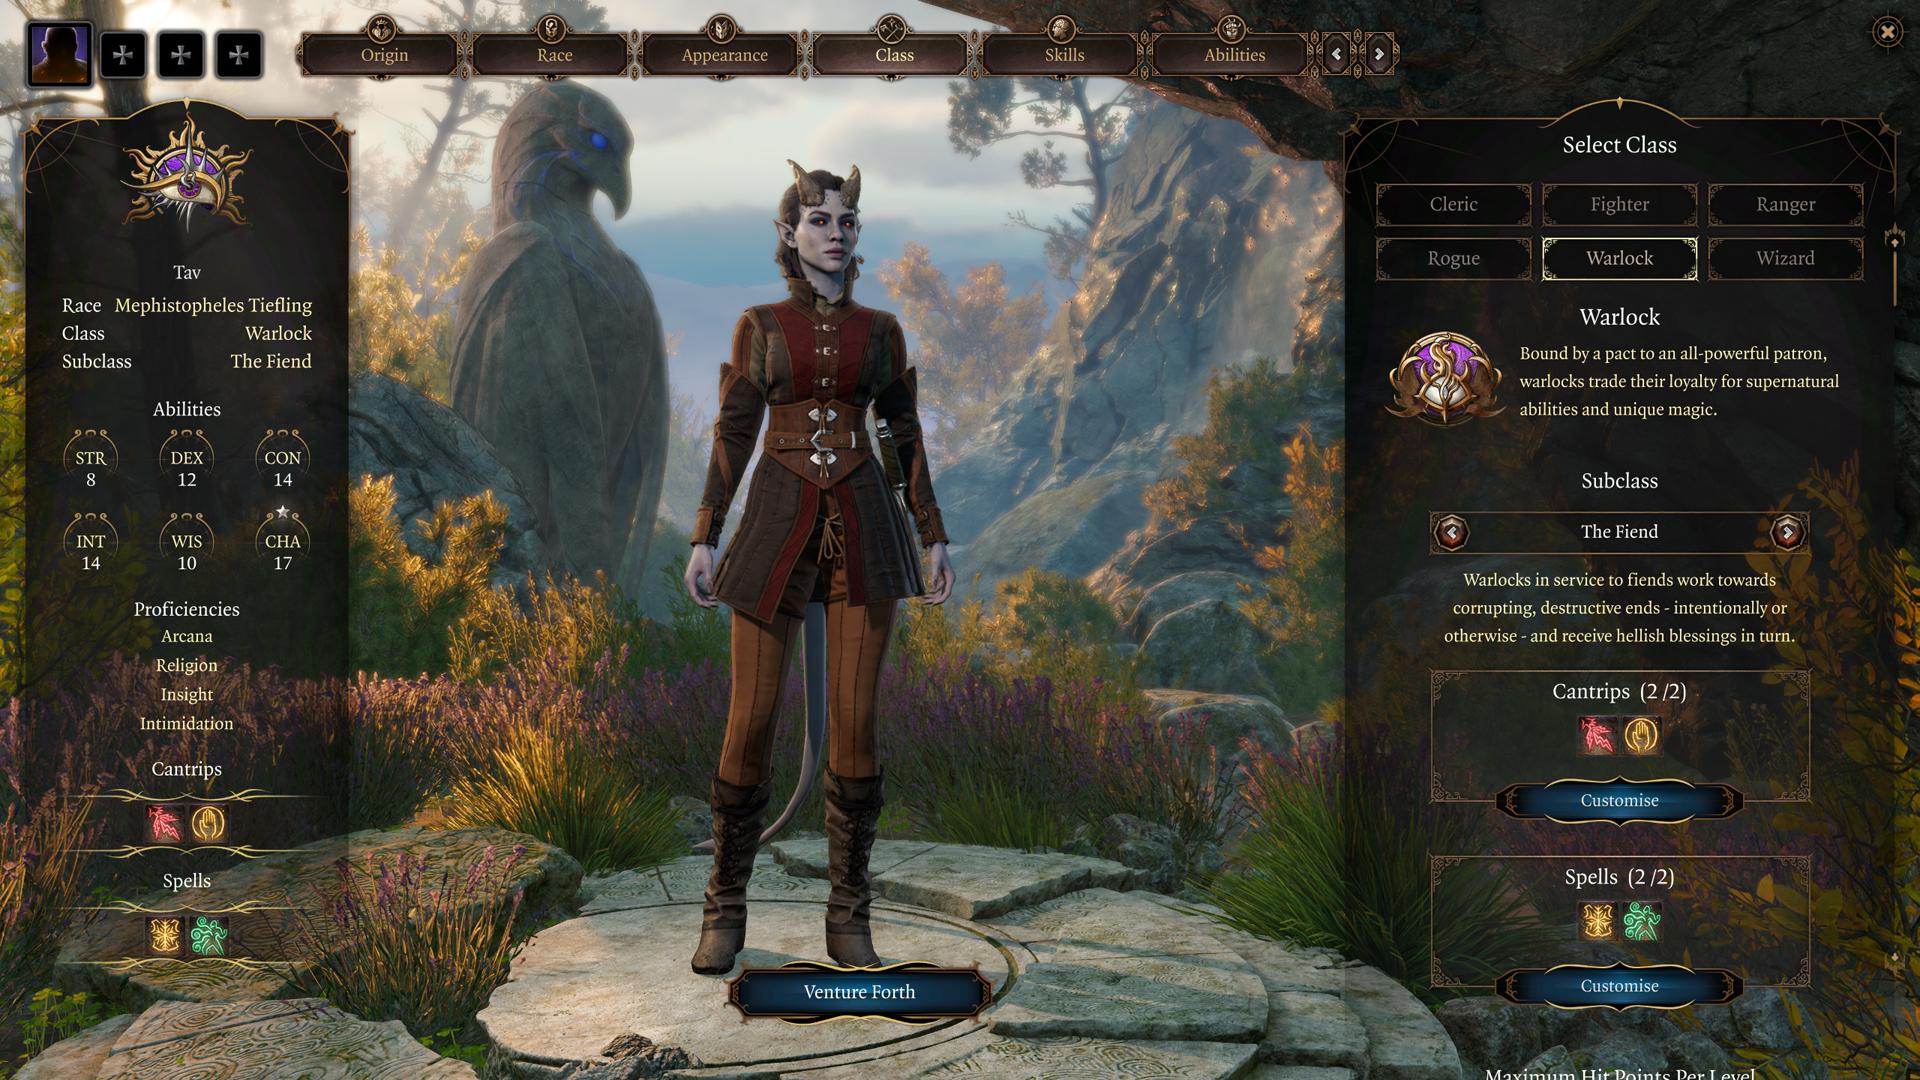 Baldur's Gate 3 [GOG] Скачать Лицензия